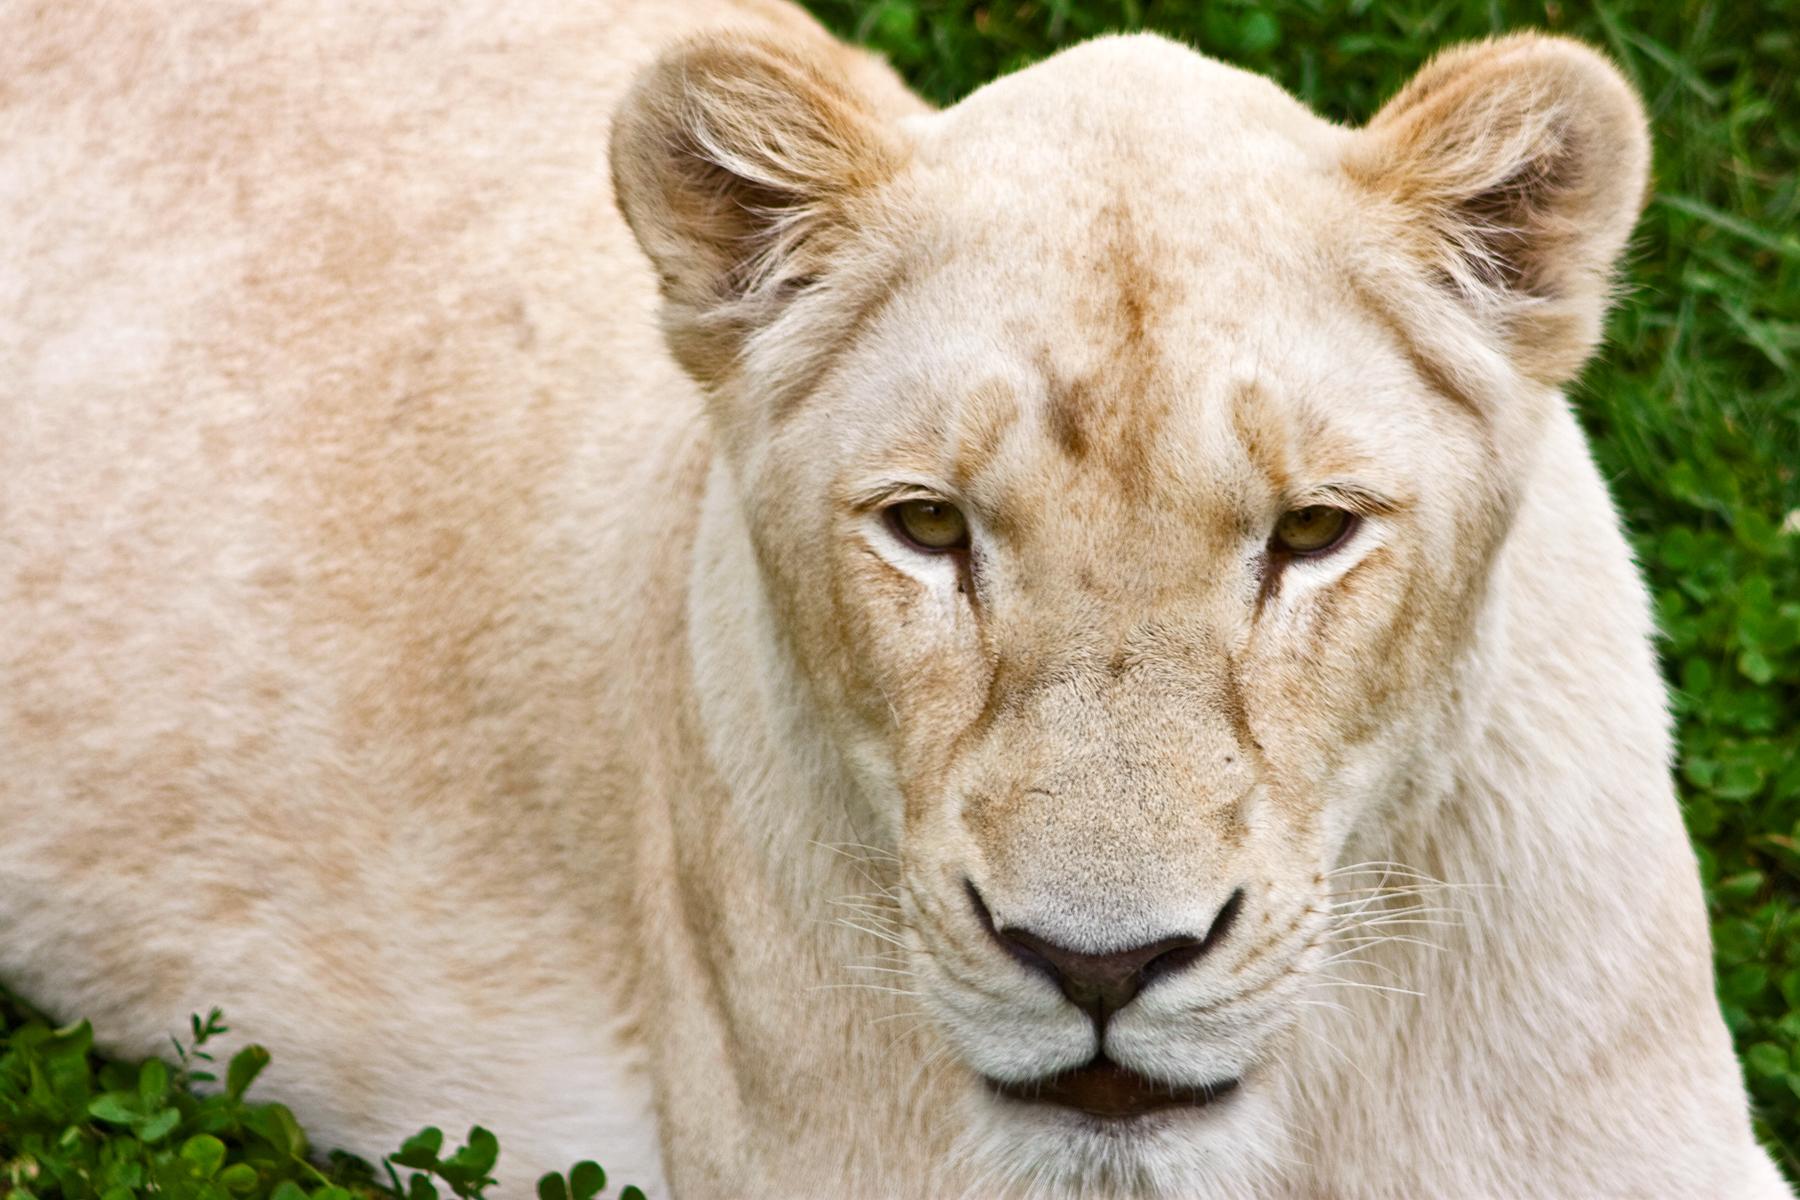 White Lioness, Animal, Image, Lion, Lioness, HQ Photo